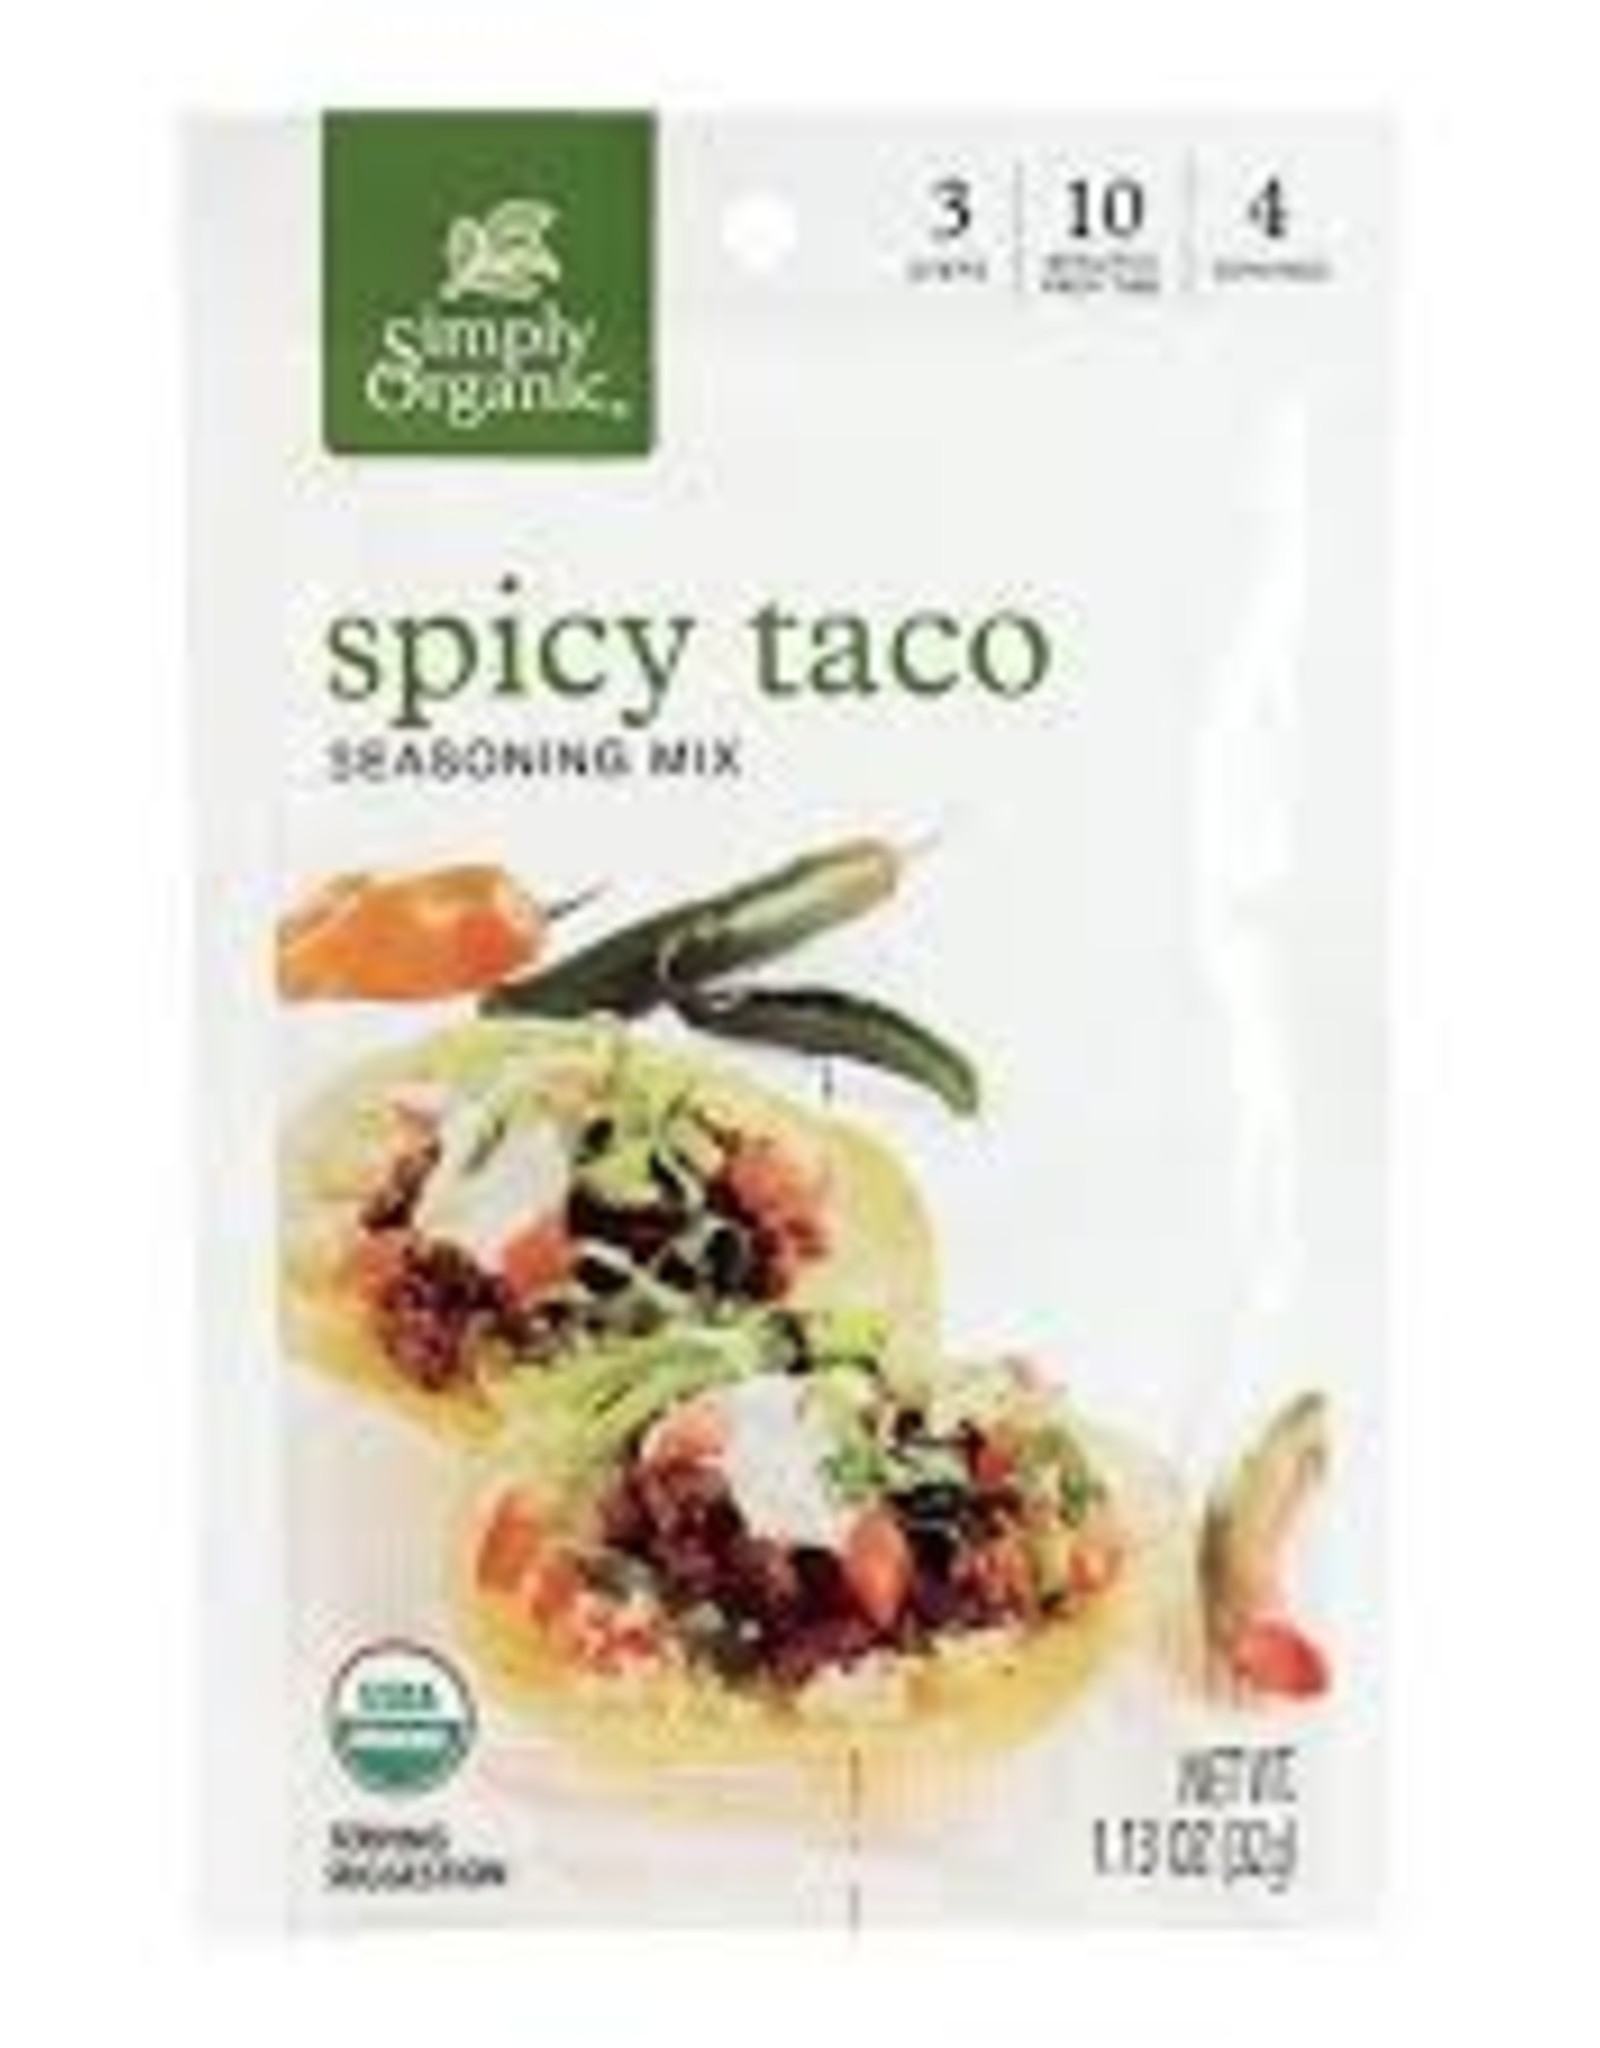 Simlpy Organic Simply Organic - Seasoning Mix, Spicy Taco